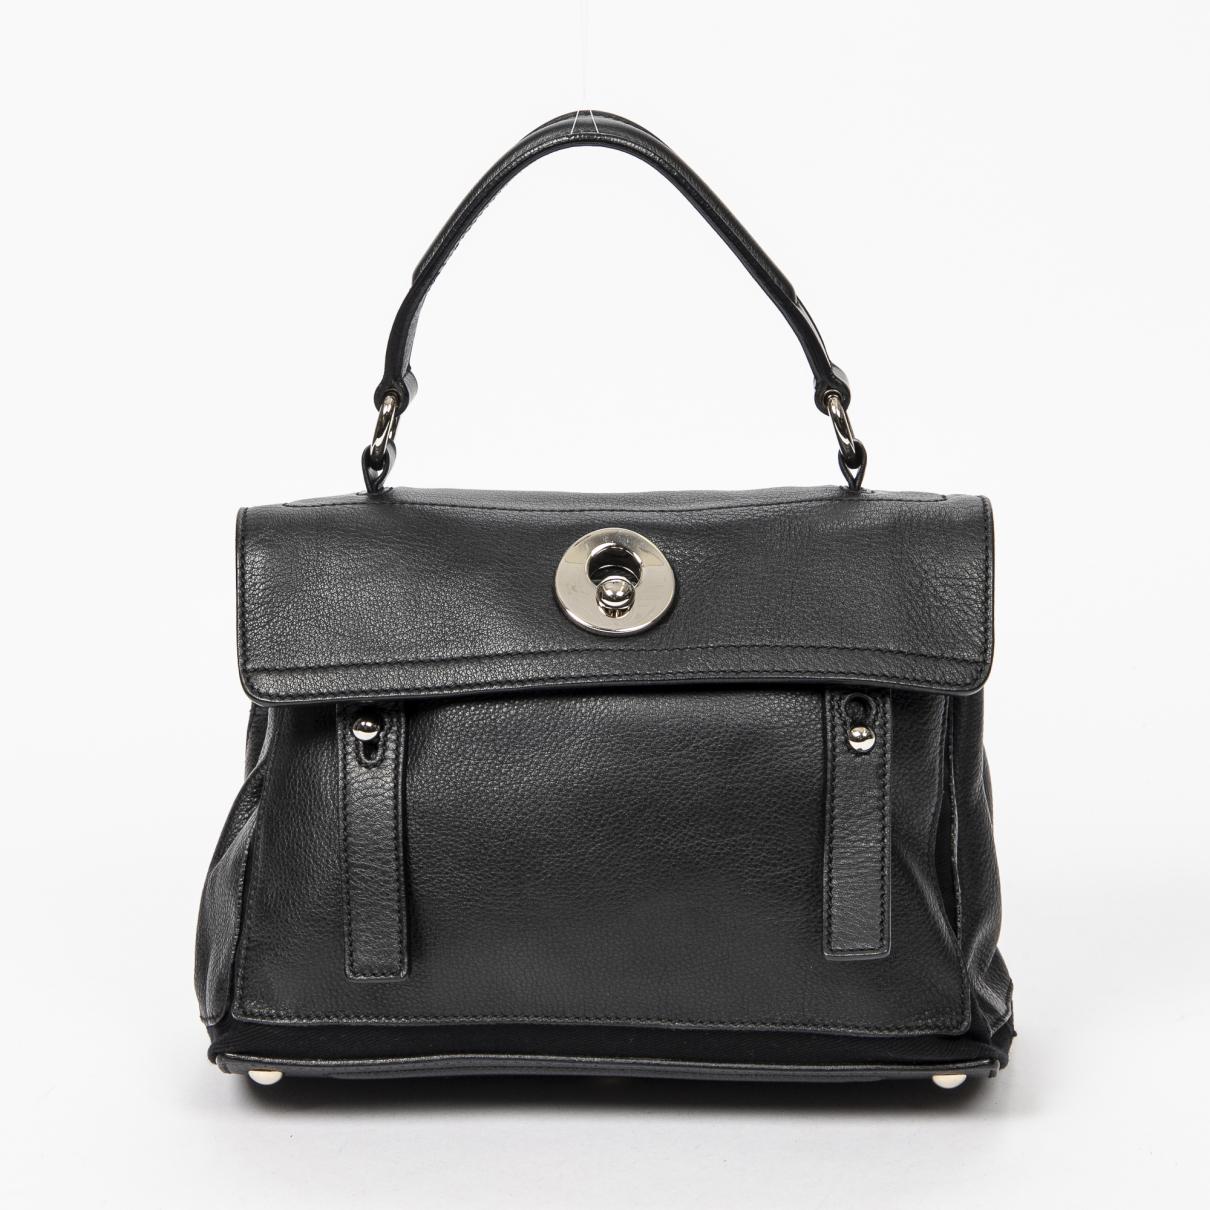 Yves Saint Laurent Muse Two Handtasche in  Schwarz Leder